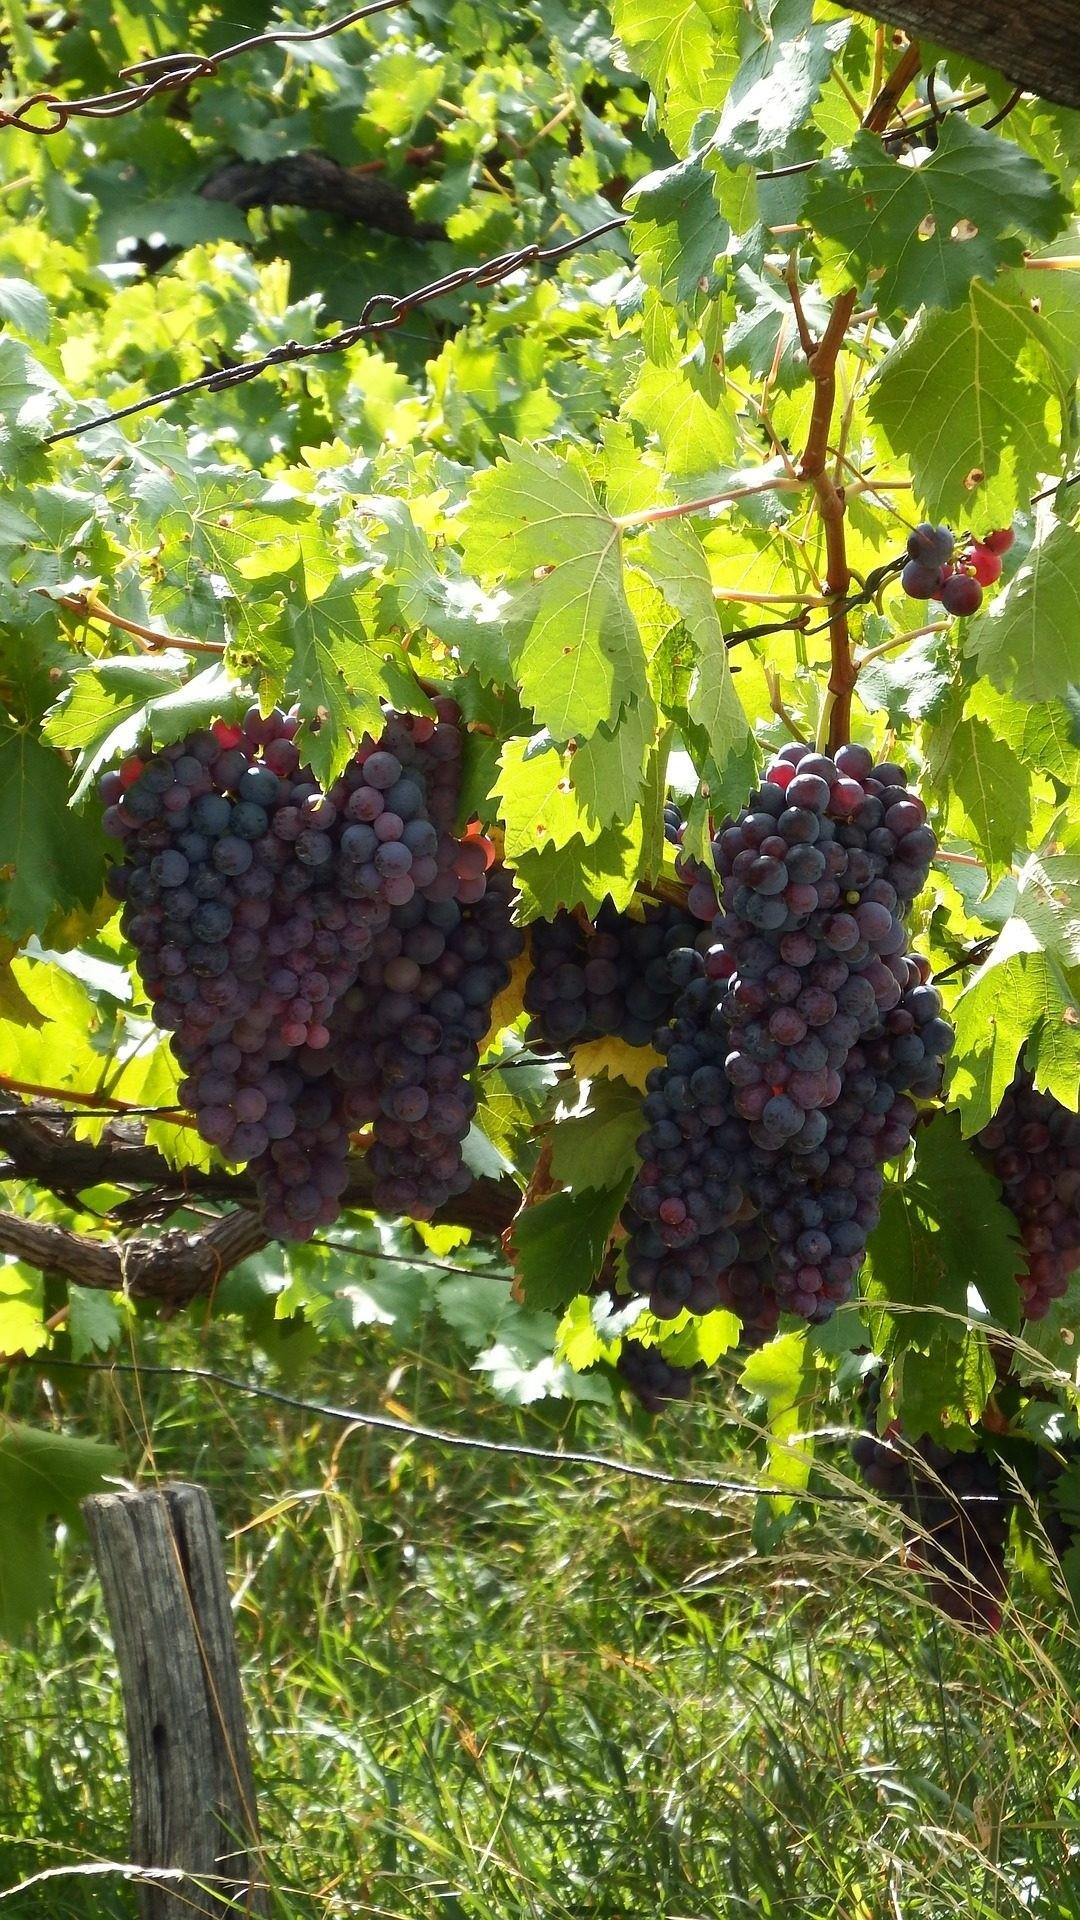 Vineyard Vines phone background